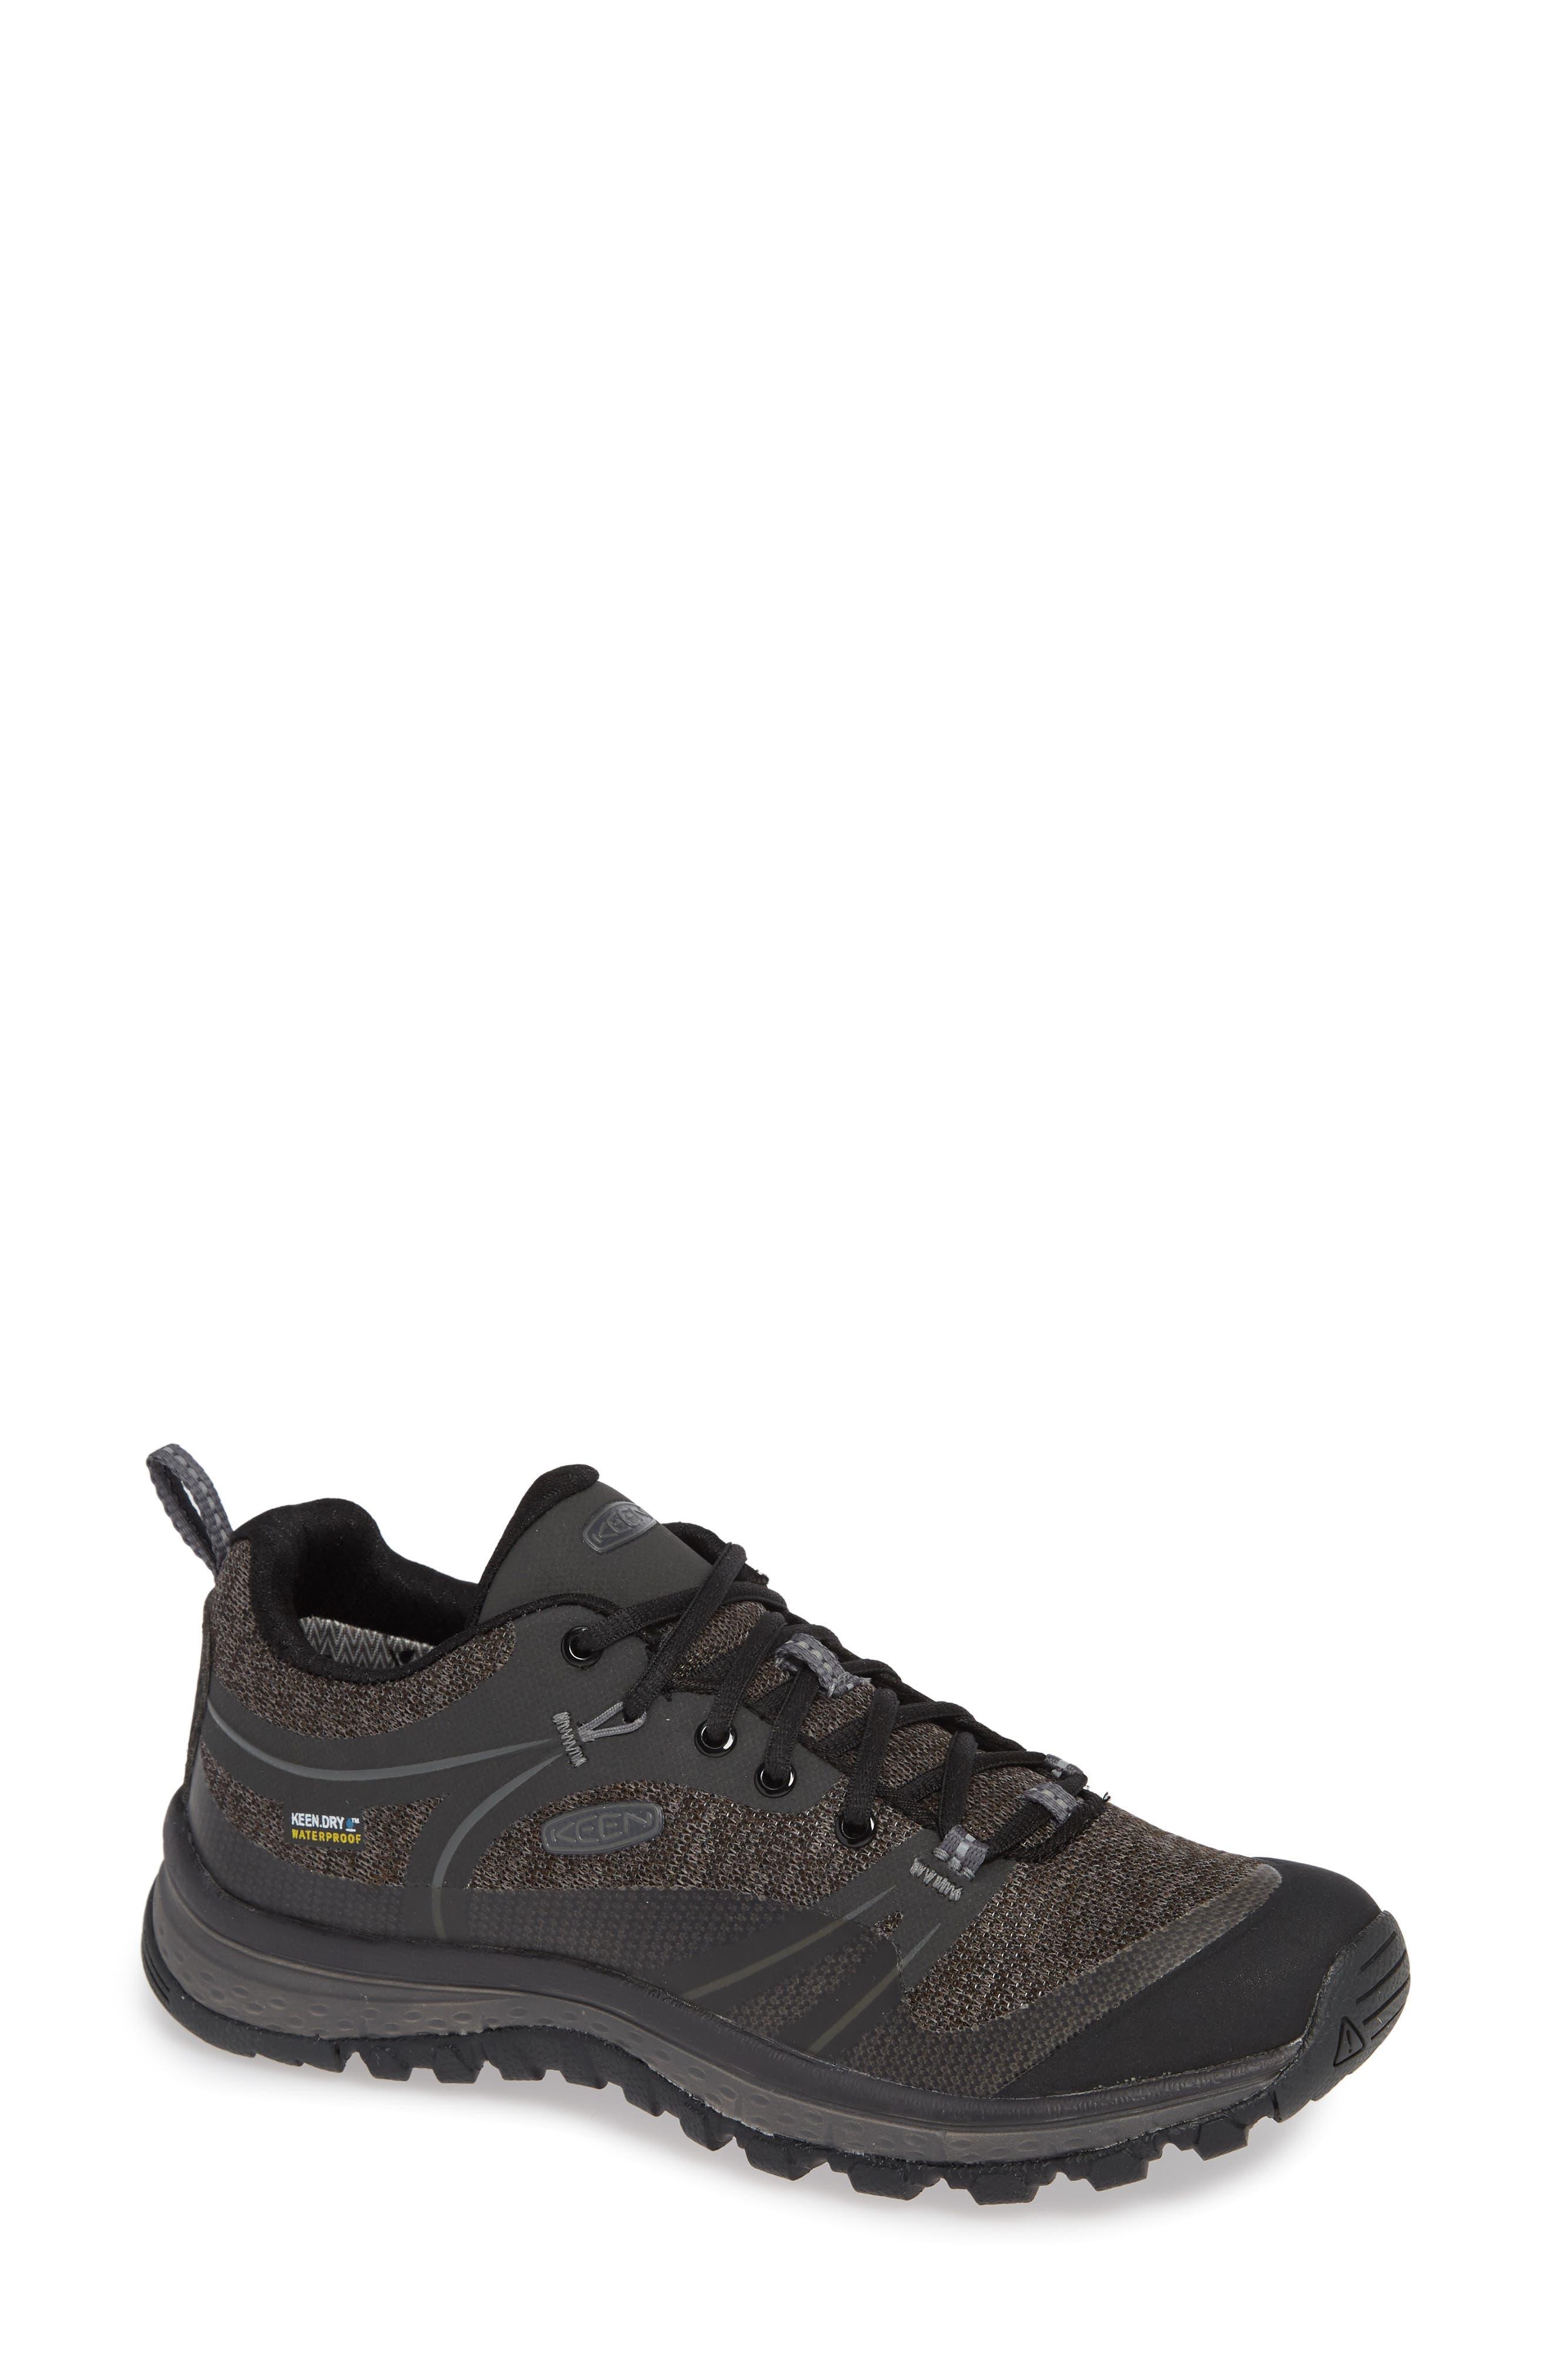 KEEN, Terradora Hiking Waterproof Sneaker, Main thumbnail 1, color, RAVEN/ GARGOYLE